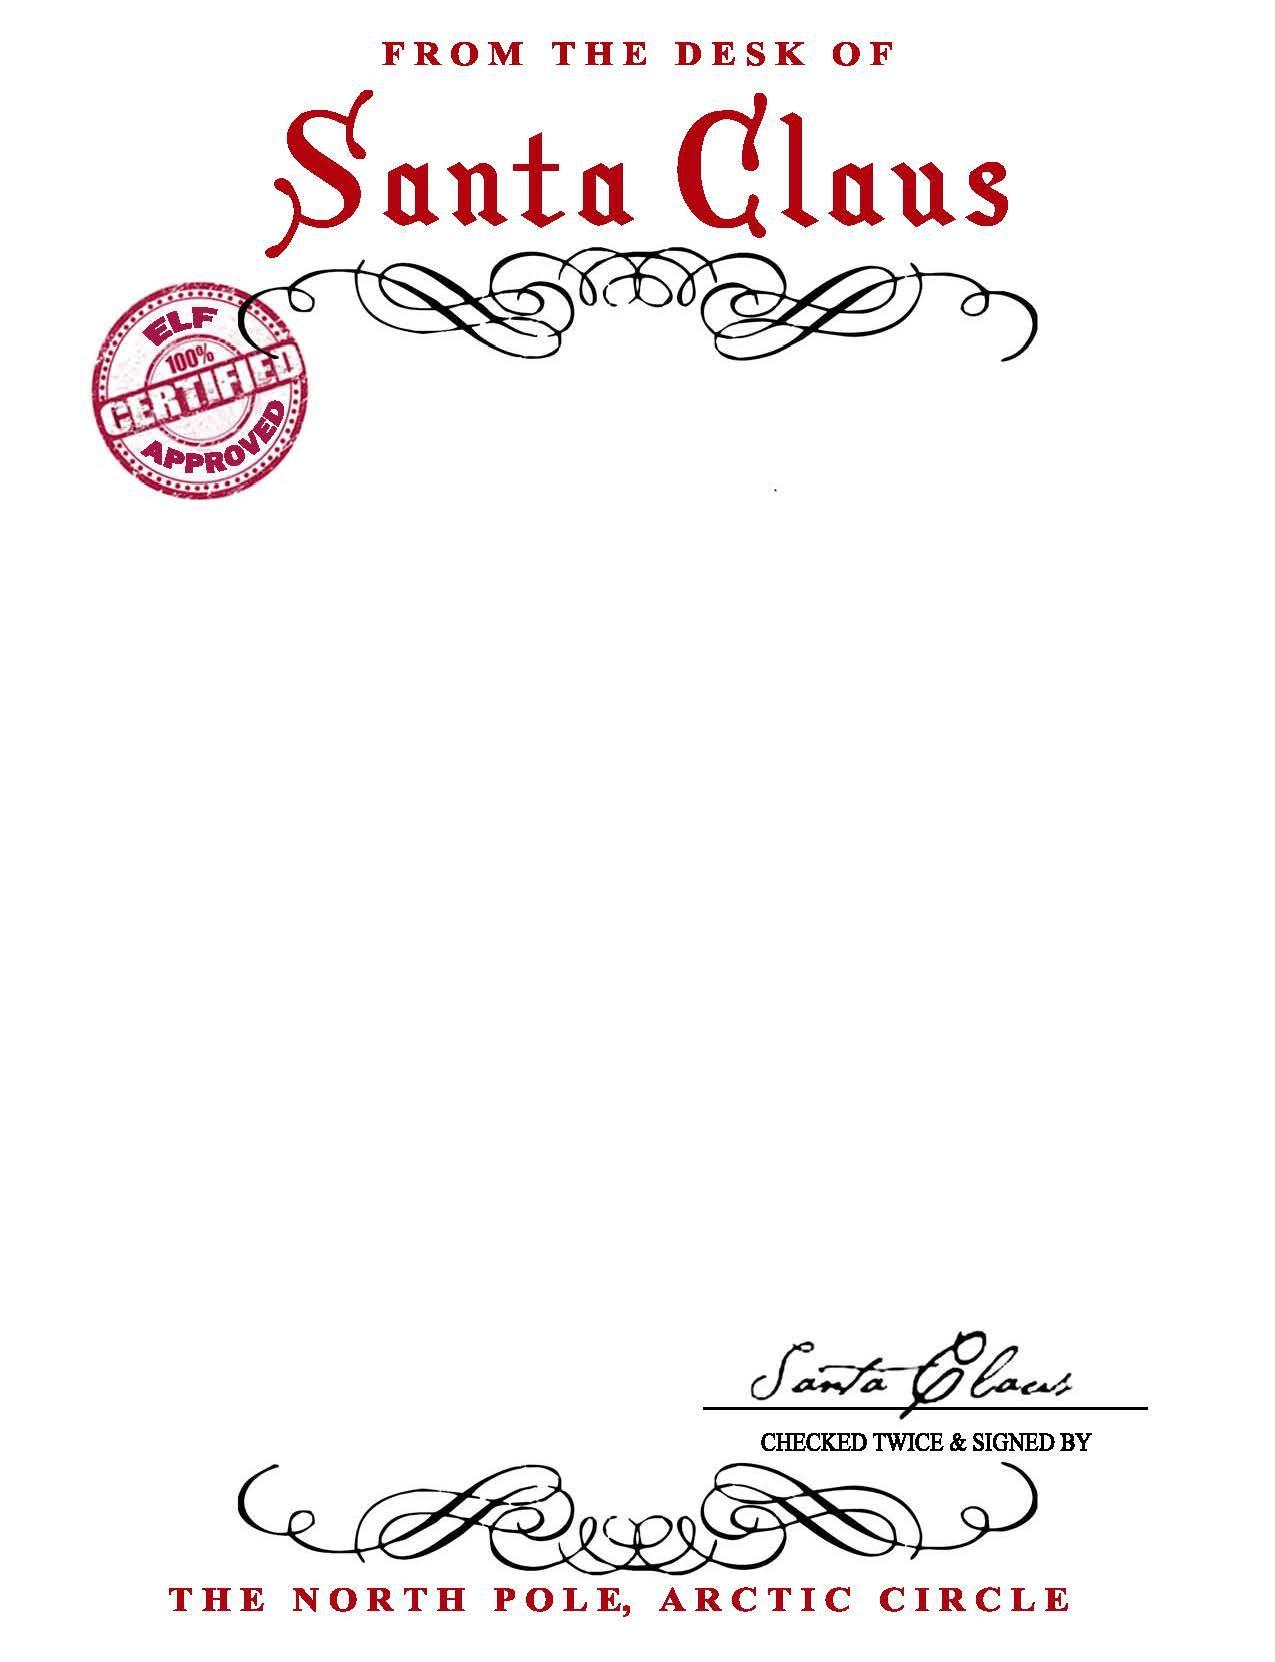 Secret Santa Letter Template - Santa Claus Letterhead Will Bring Lots Of Joy to Children